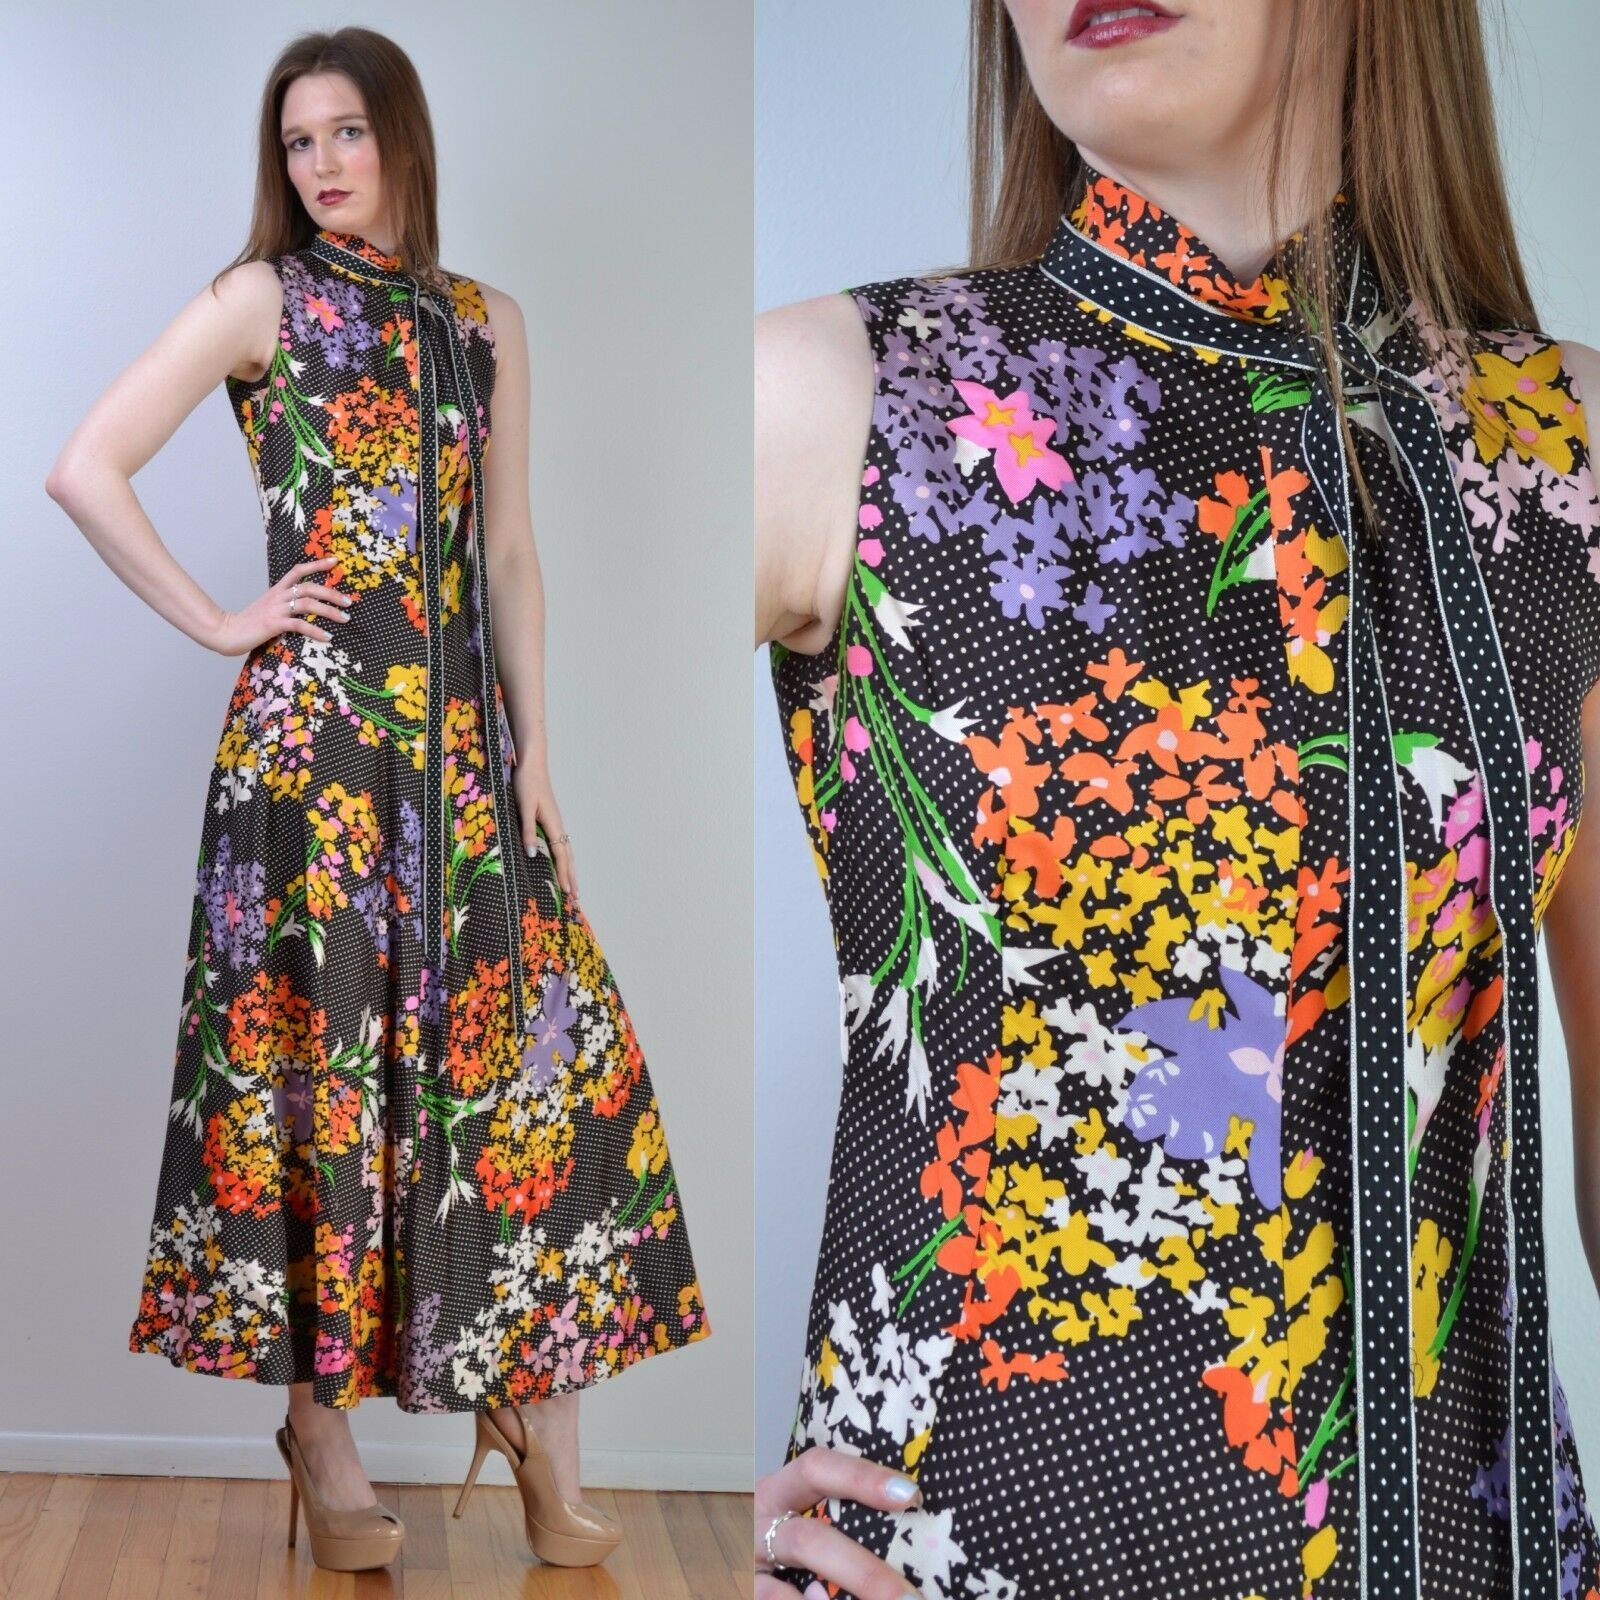 VTG 70s GEOFFREY BEENE Graphic Floral + Polka Dot Full Circle Maxi DRESS S-M